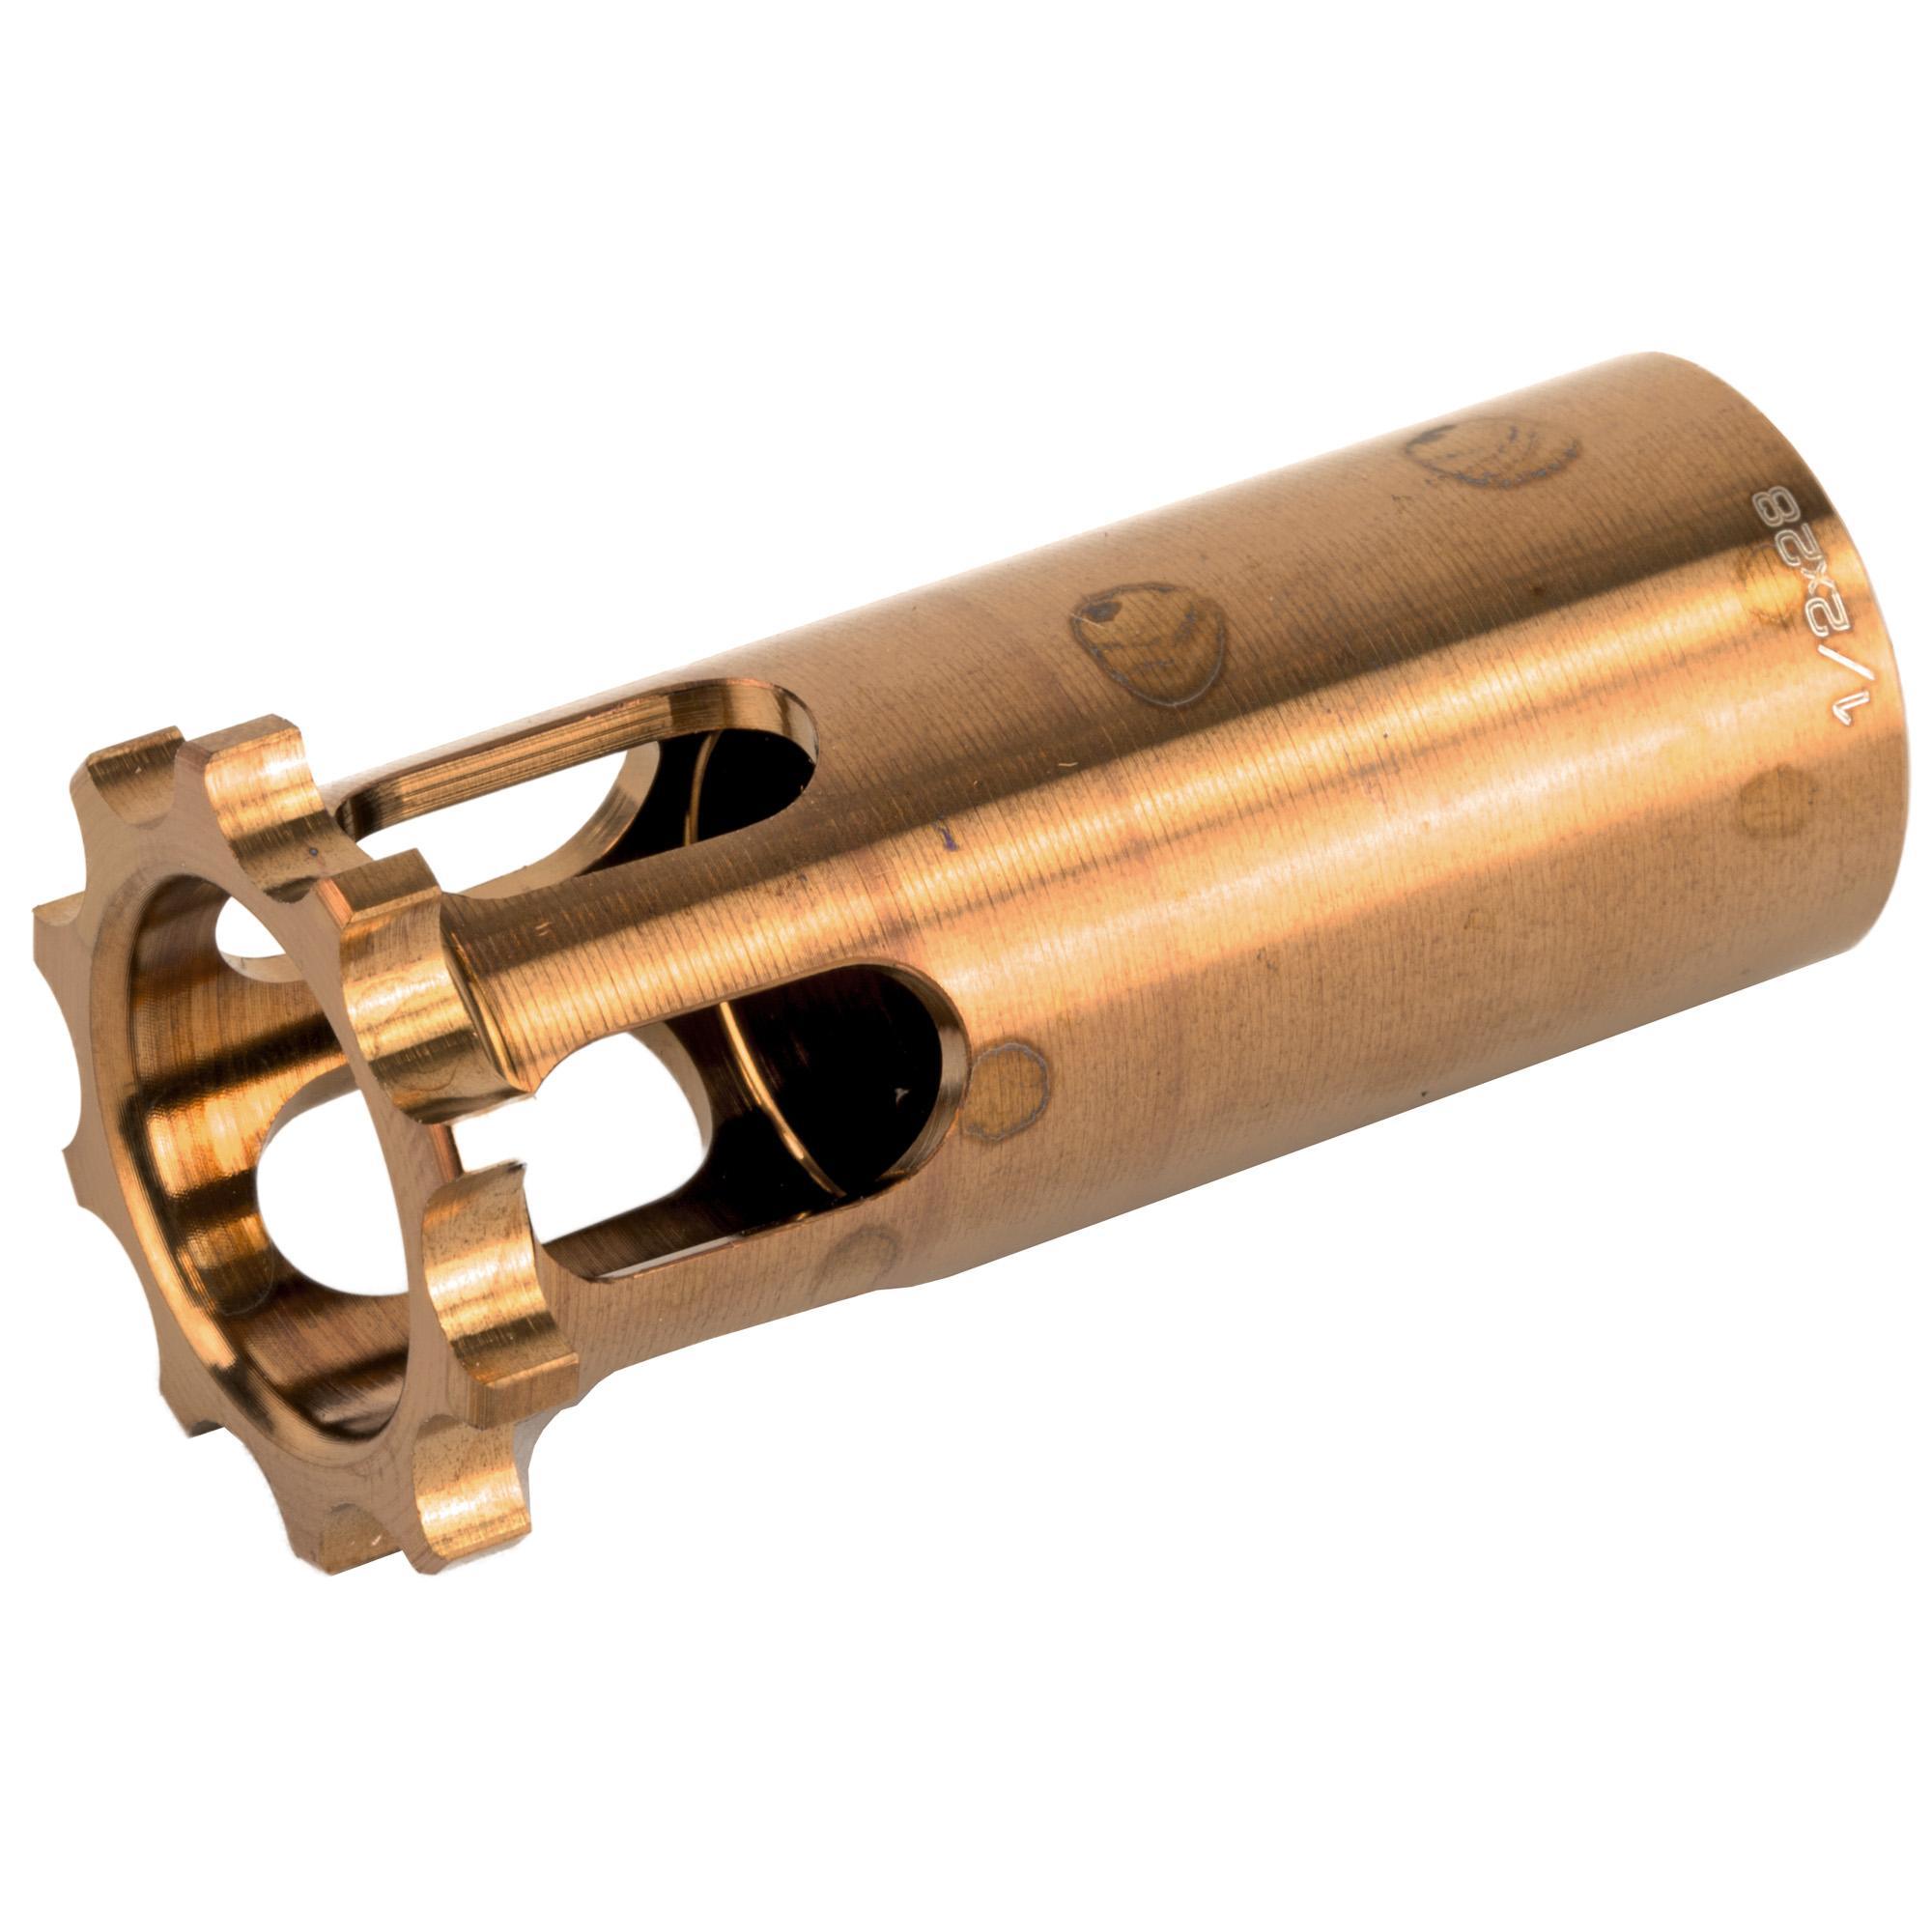 Rugged Suppressors Rugged Piston 1/2x28